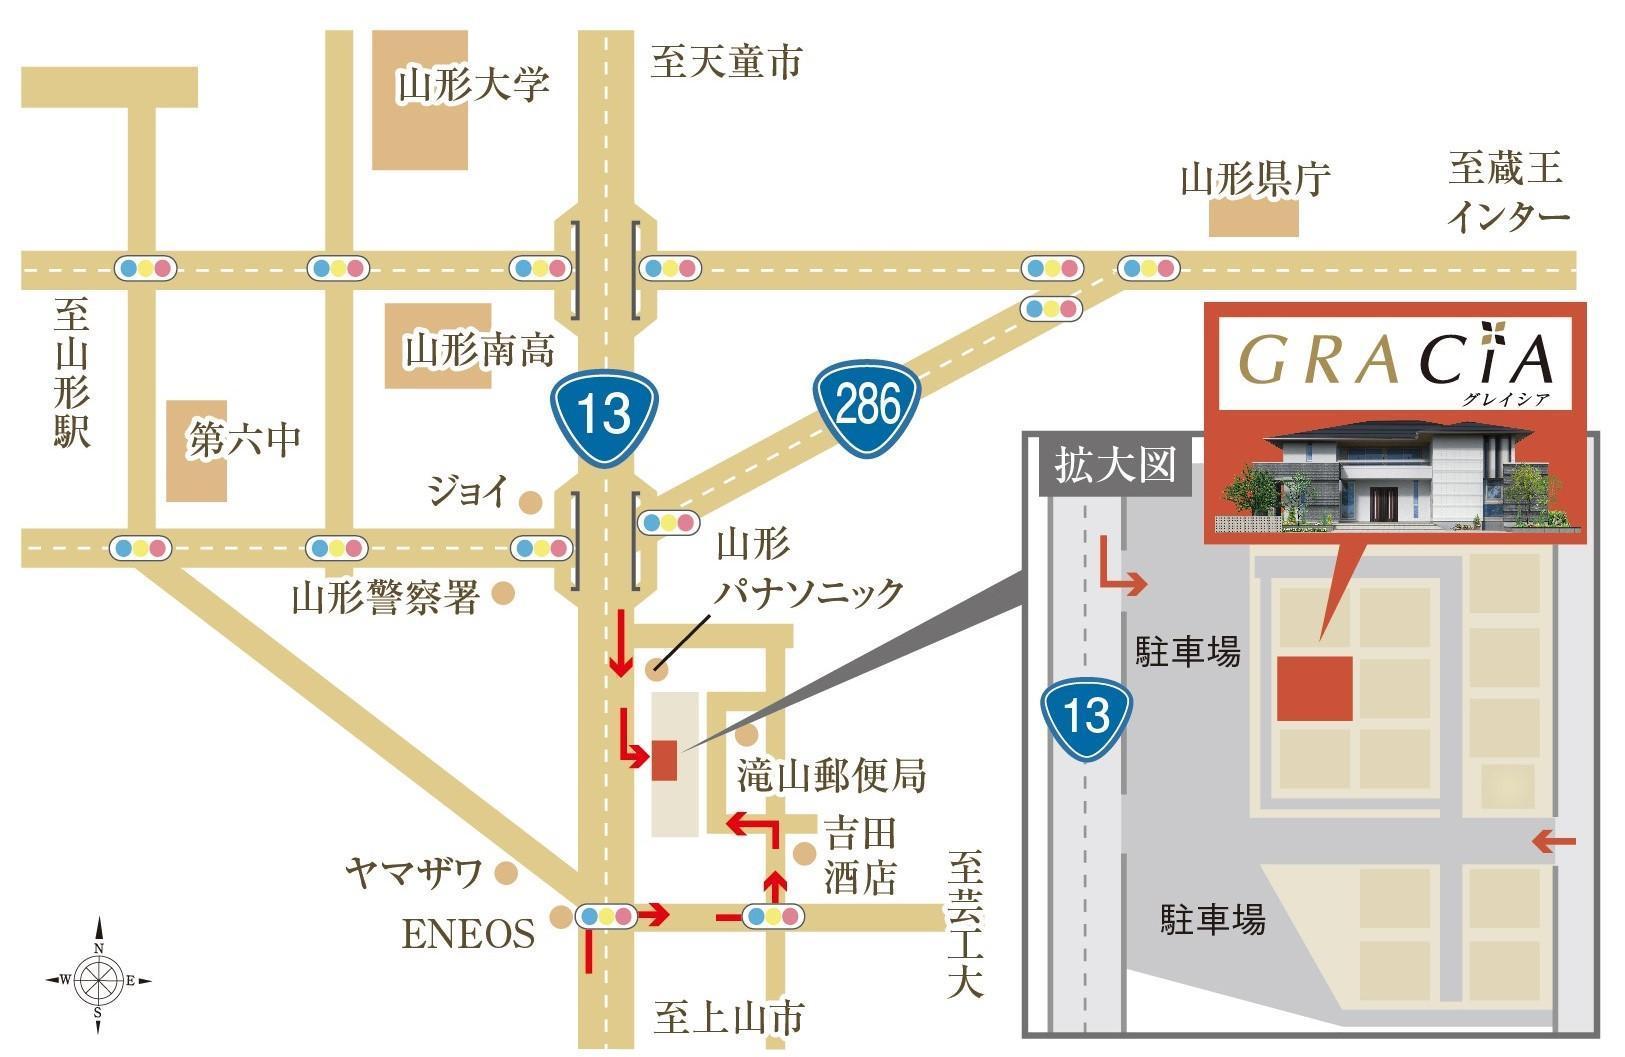 Gracia_map.jpg